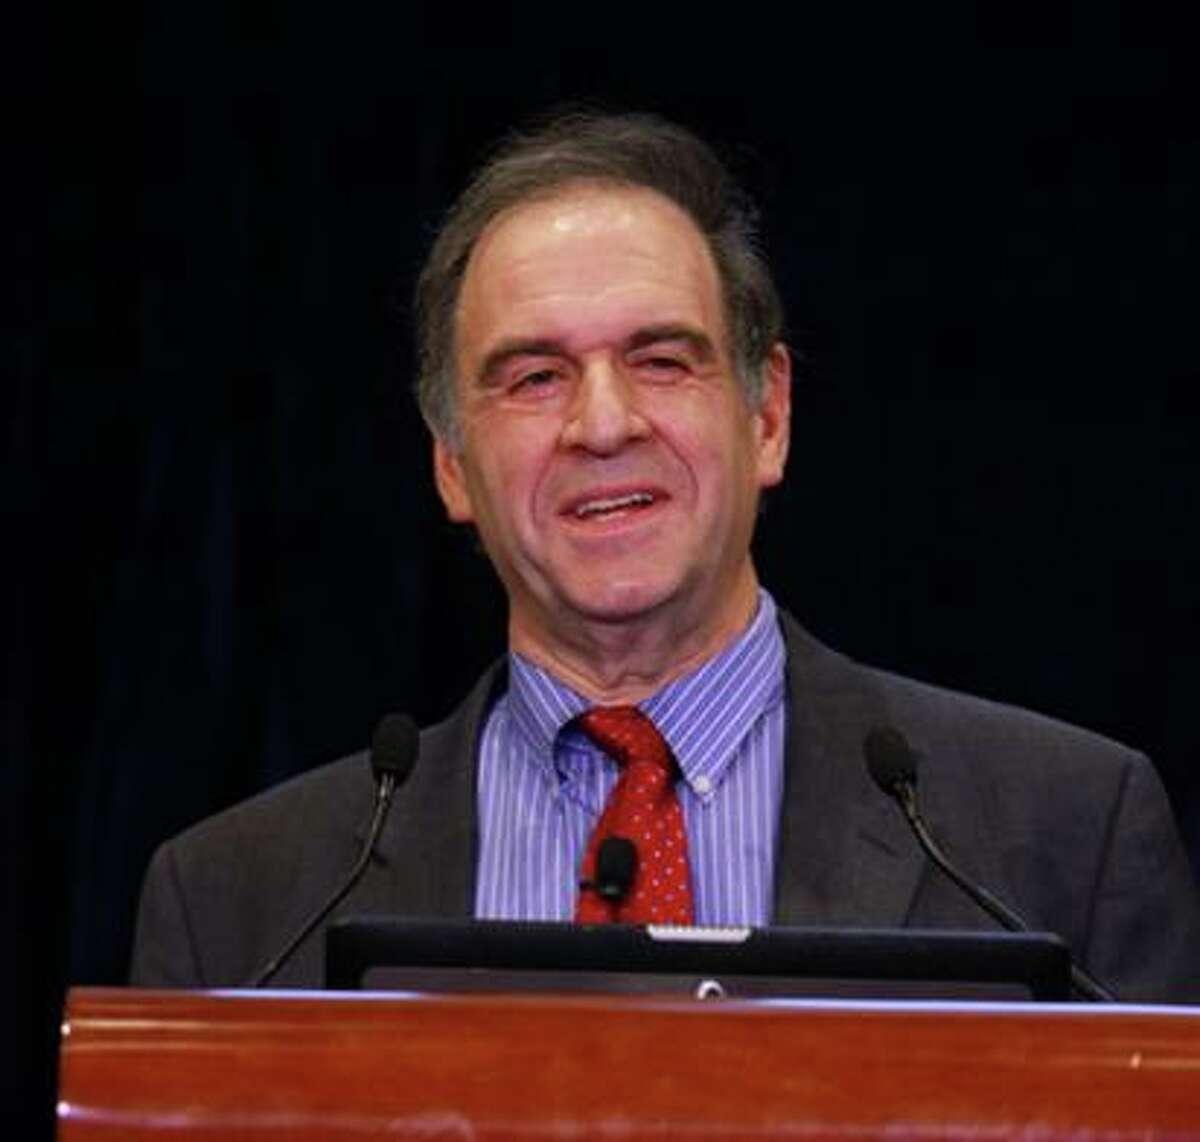 Economist Jeffrey Sonnenfeld of the Yale School of Management, who is senior dean for leadership studies. (Photo courtesy Jeffrey Sonnenfeld)